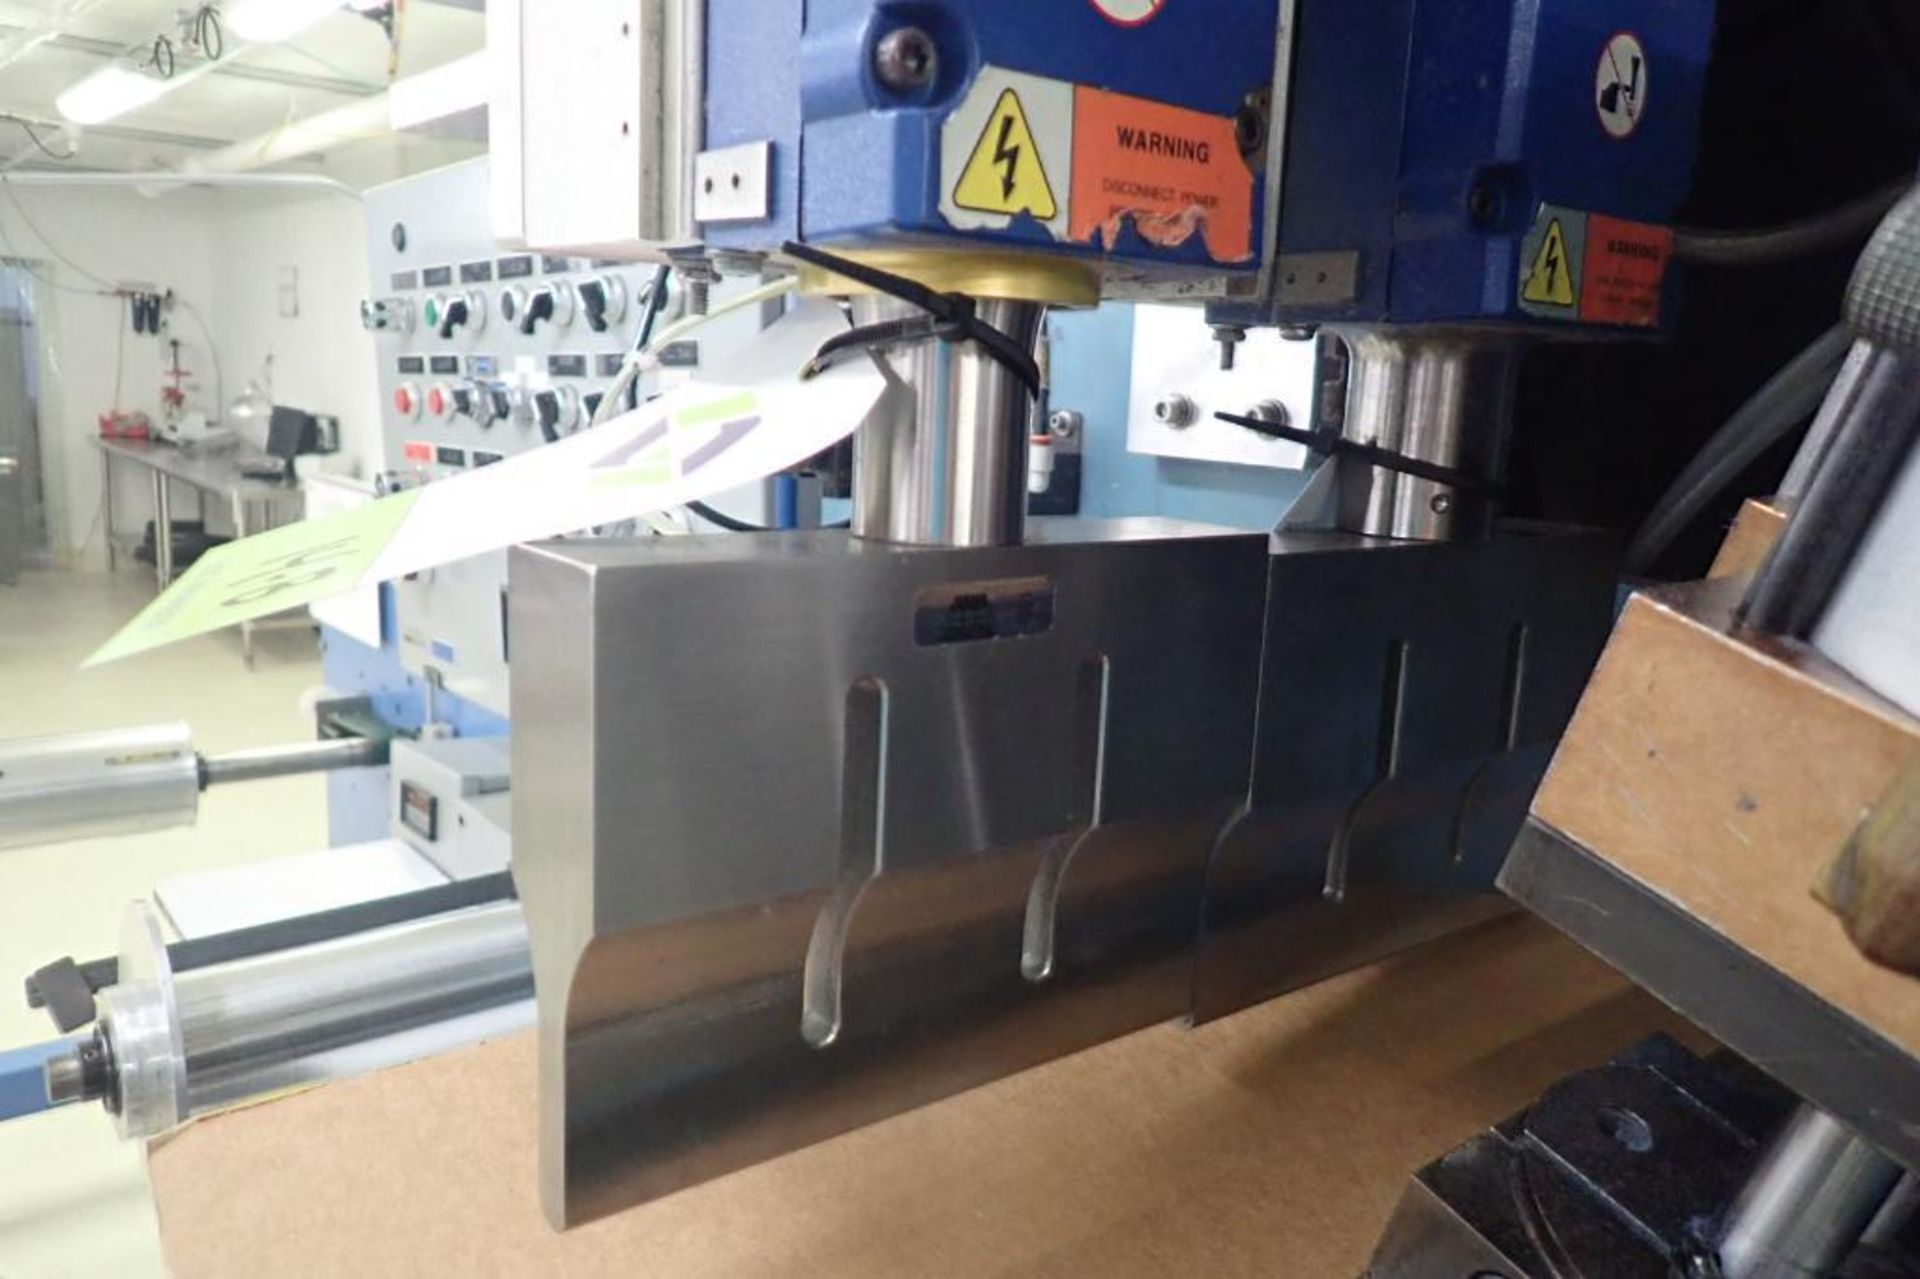 Lot 14B - Branson 2000 ultrasonic welder, Actuator ao 3.0, 2003 Branson power supply Model 2000bdc 20:2.2 **